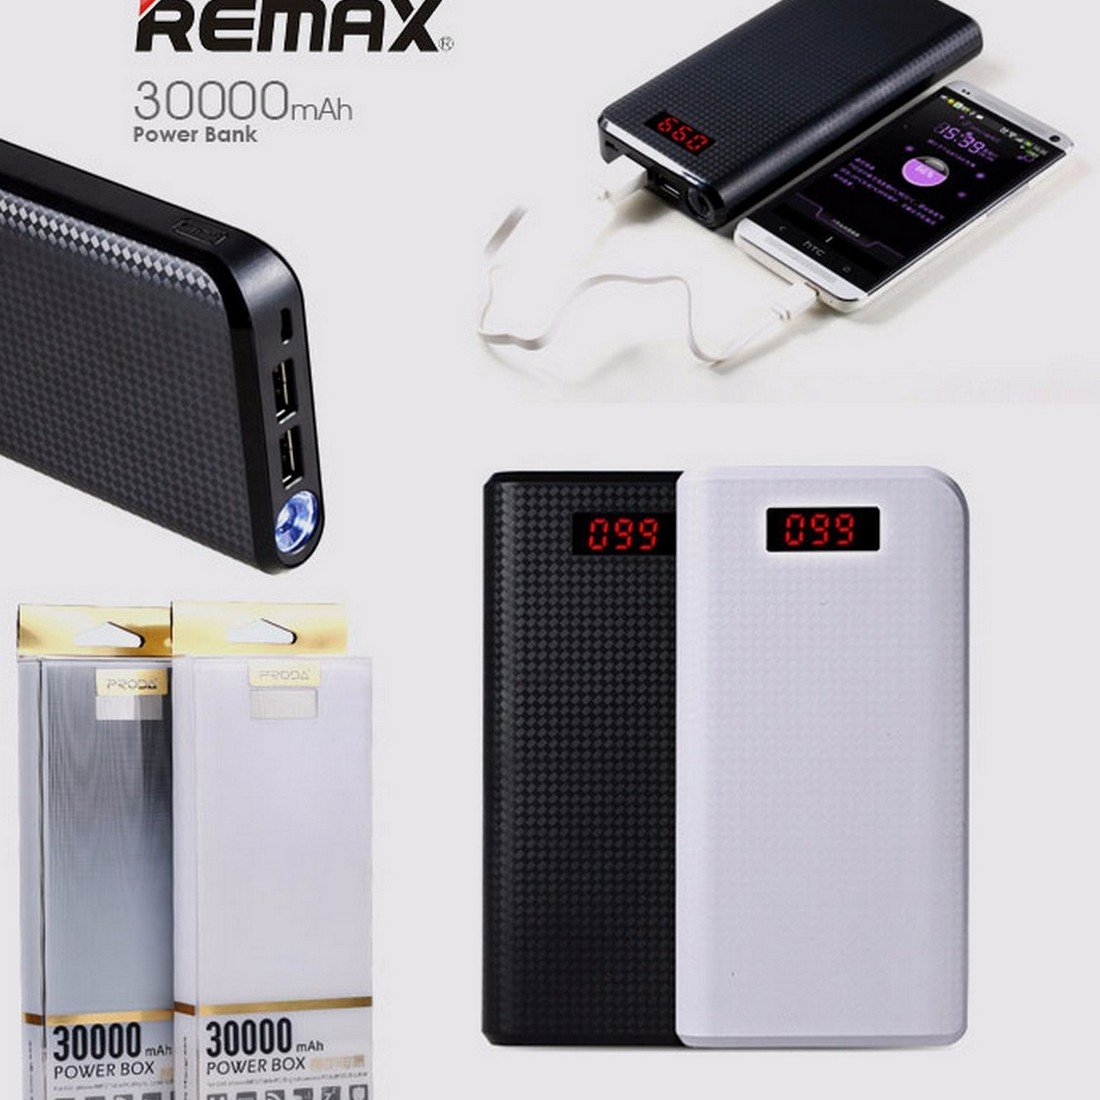 Remax 30000mah 2 Usb Port Power Bank Electronics Car Charger 3 Output Saver 36a White